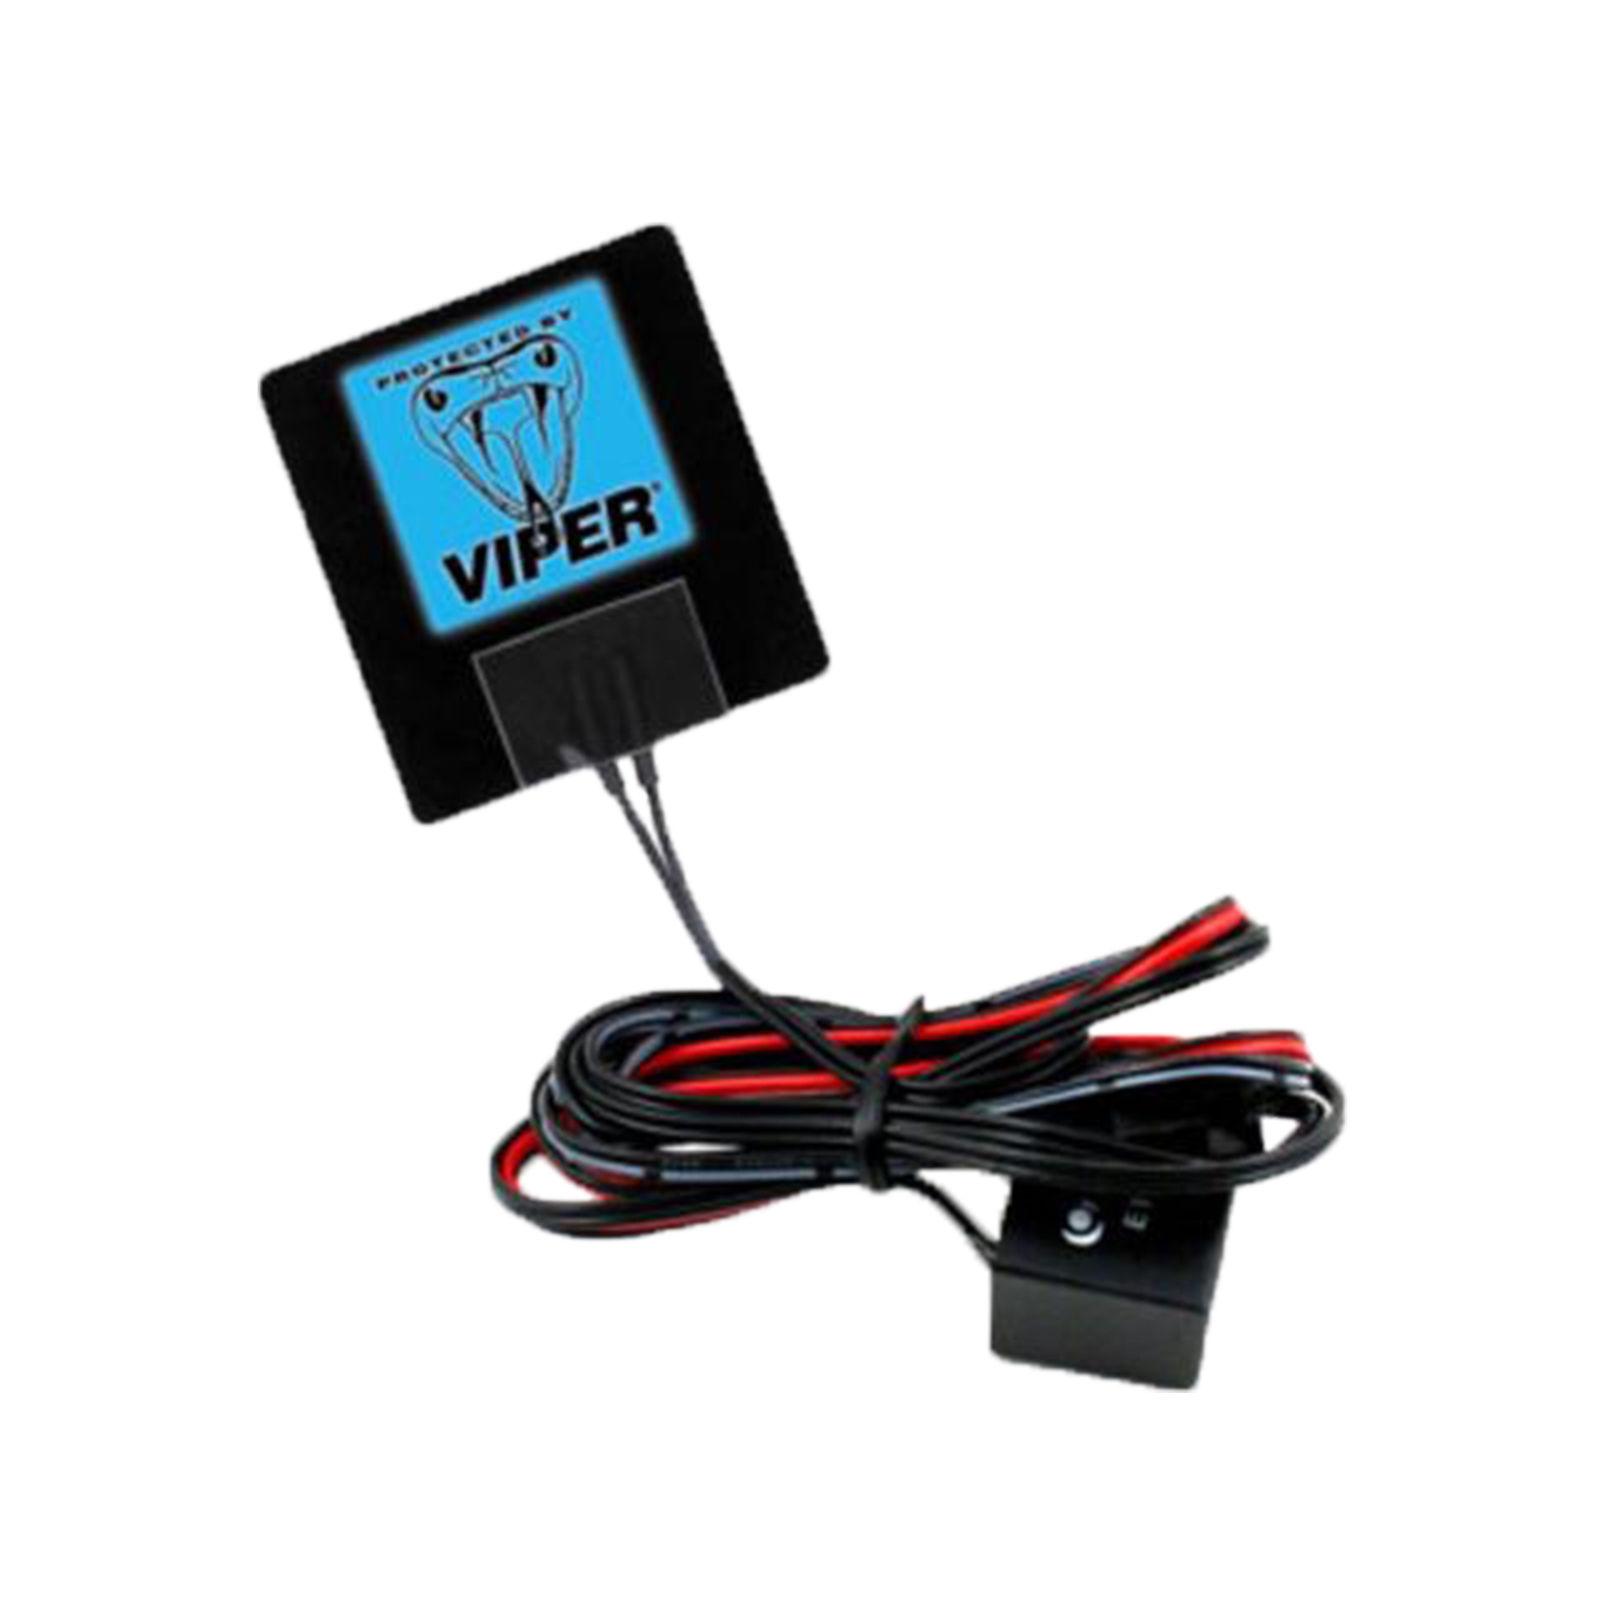 details about new viper 620v armed logo alarm light dei 5906 5904 5706 350 electro luminescent viper remote start viper electro luminescent indicator